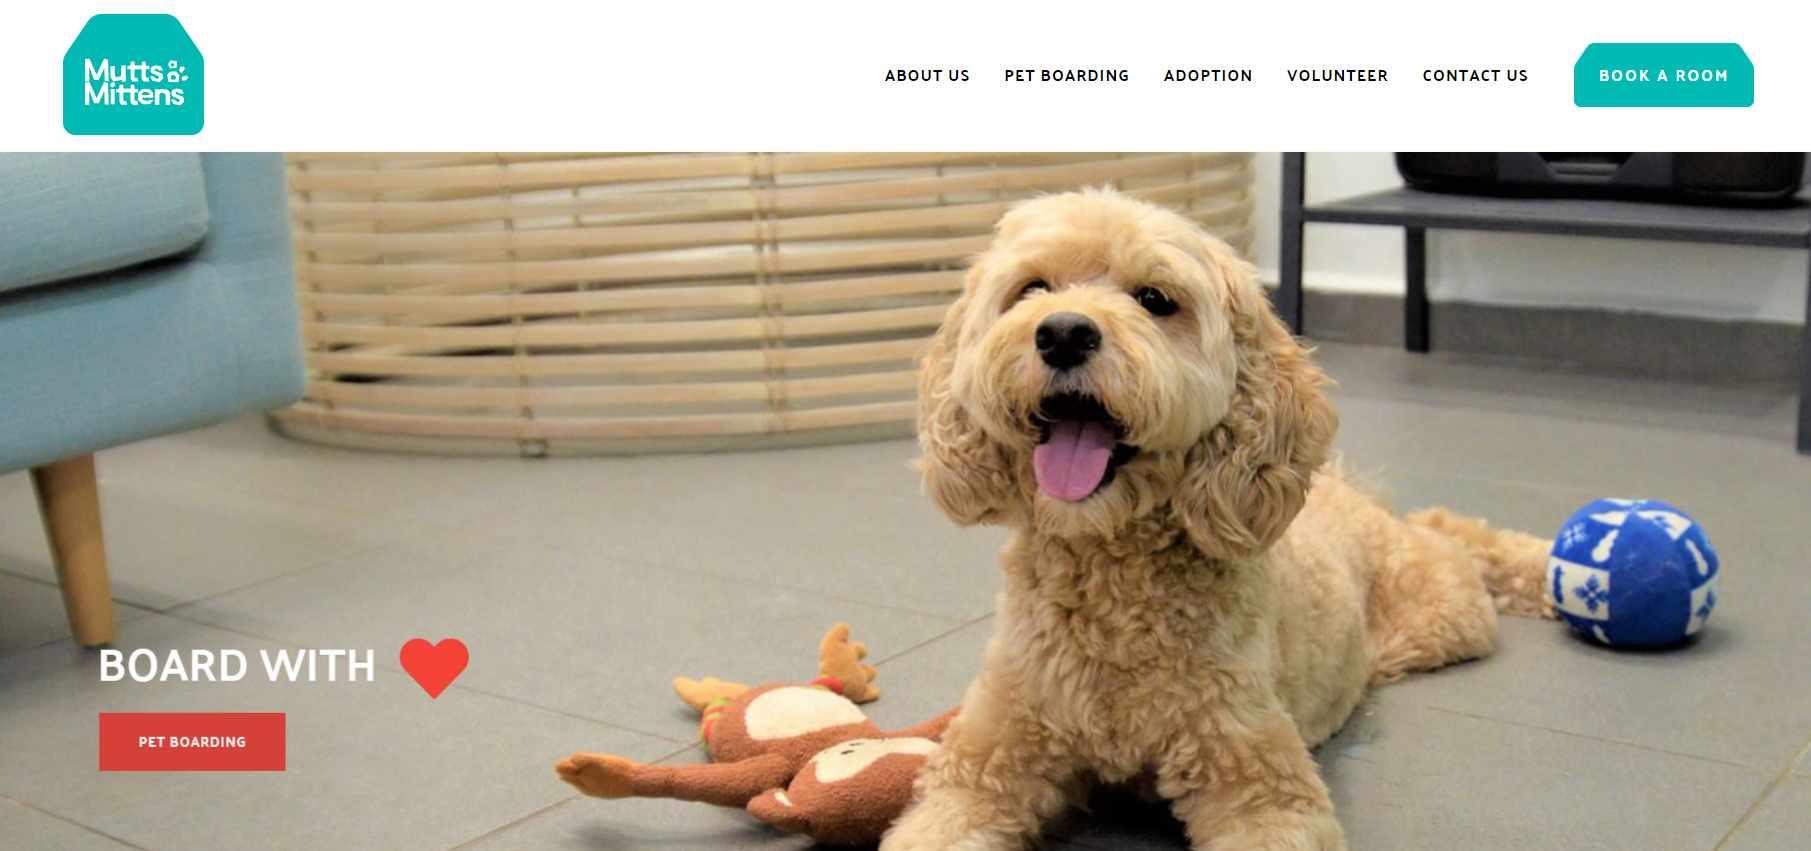 Mutt Mittens Top Pet Hotels in Singapore